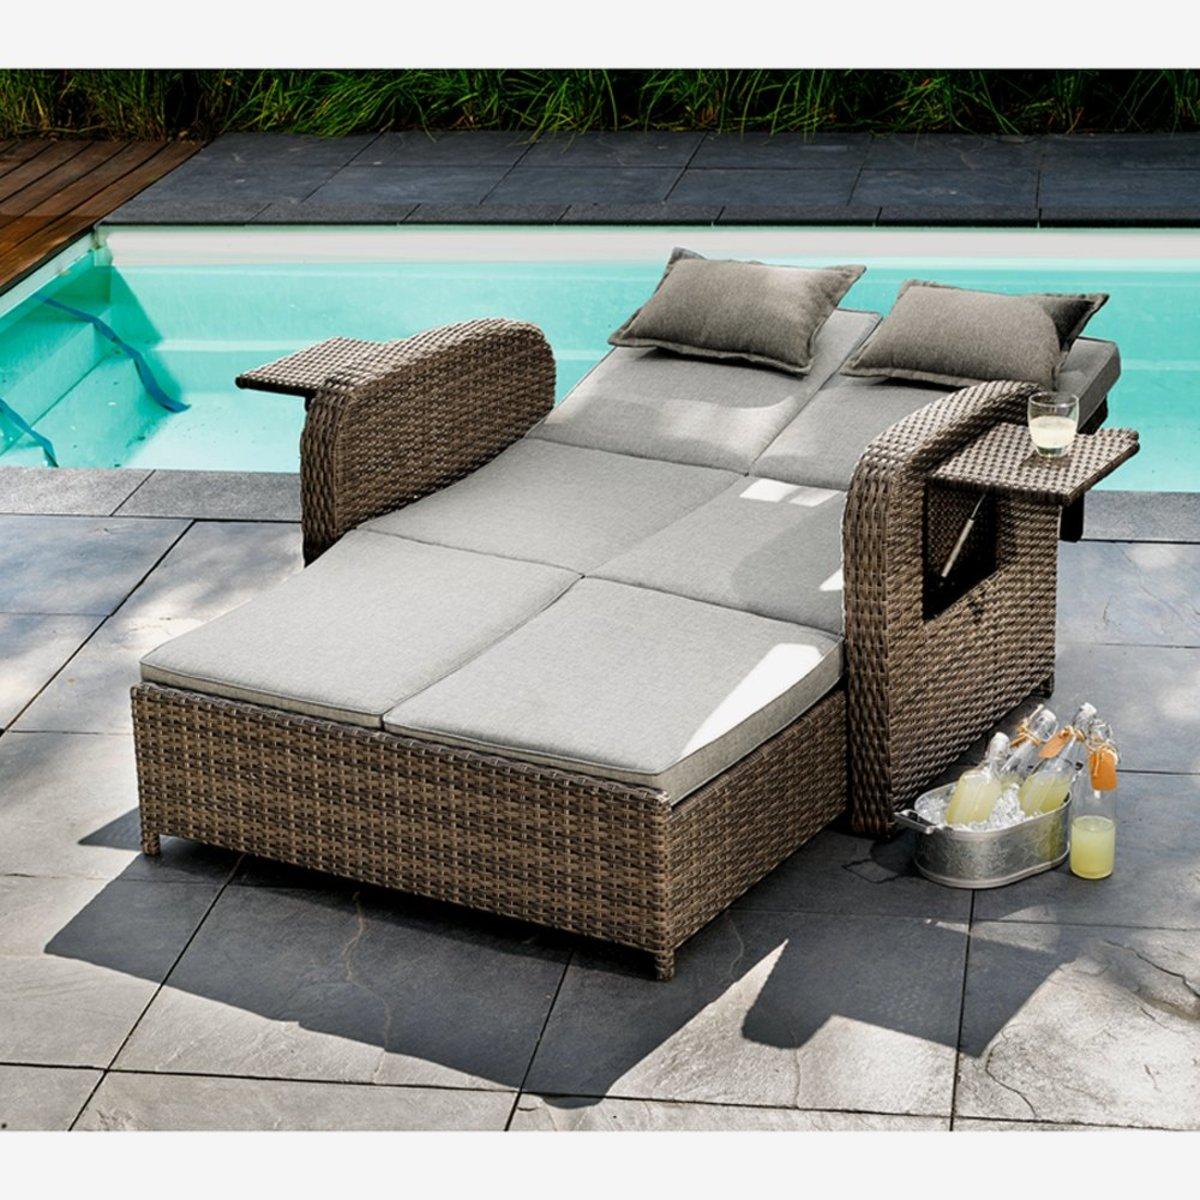 "Bild 4 von Multifunktions-Sofa ""Trinidad"" 117 x 90 x 90 cm"